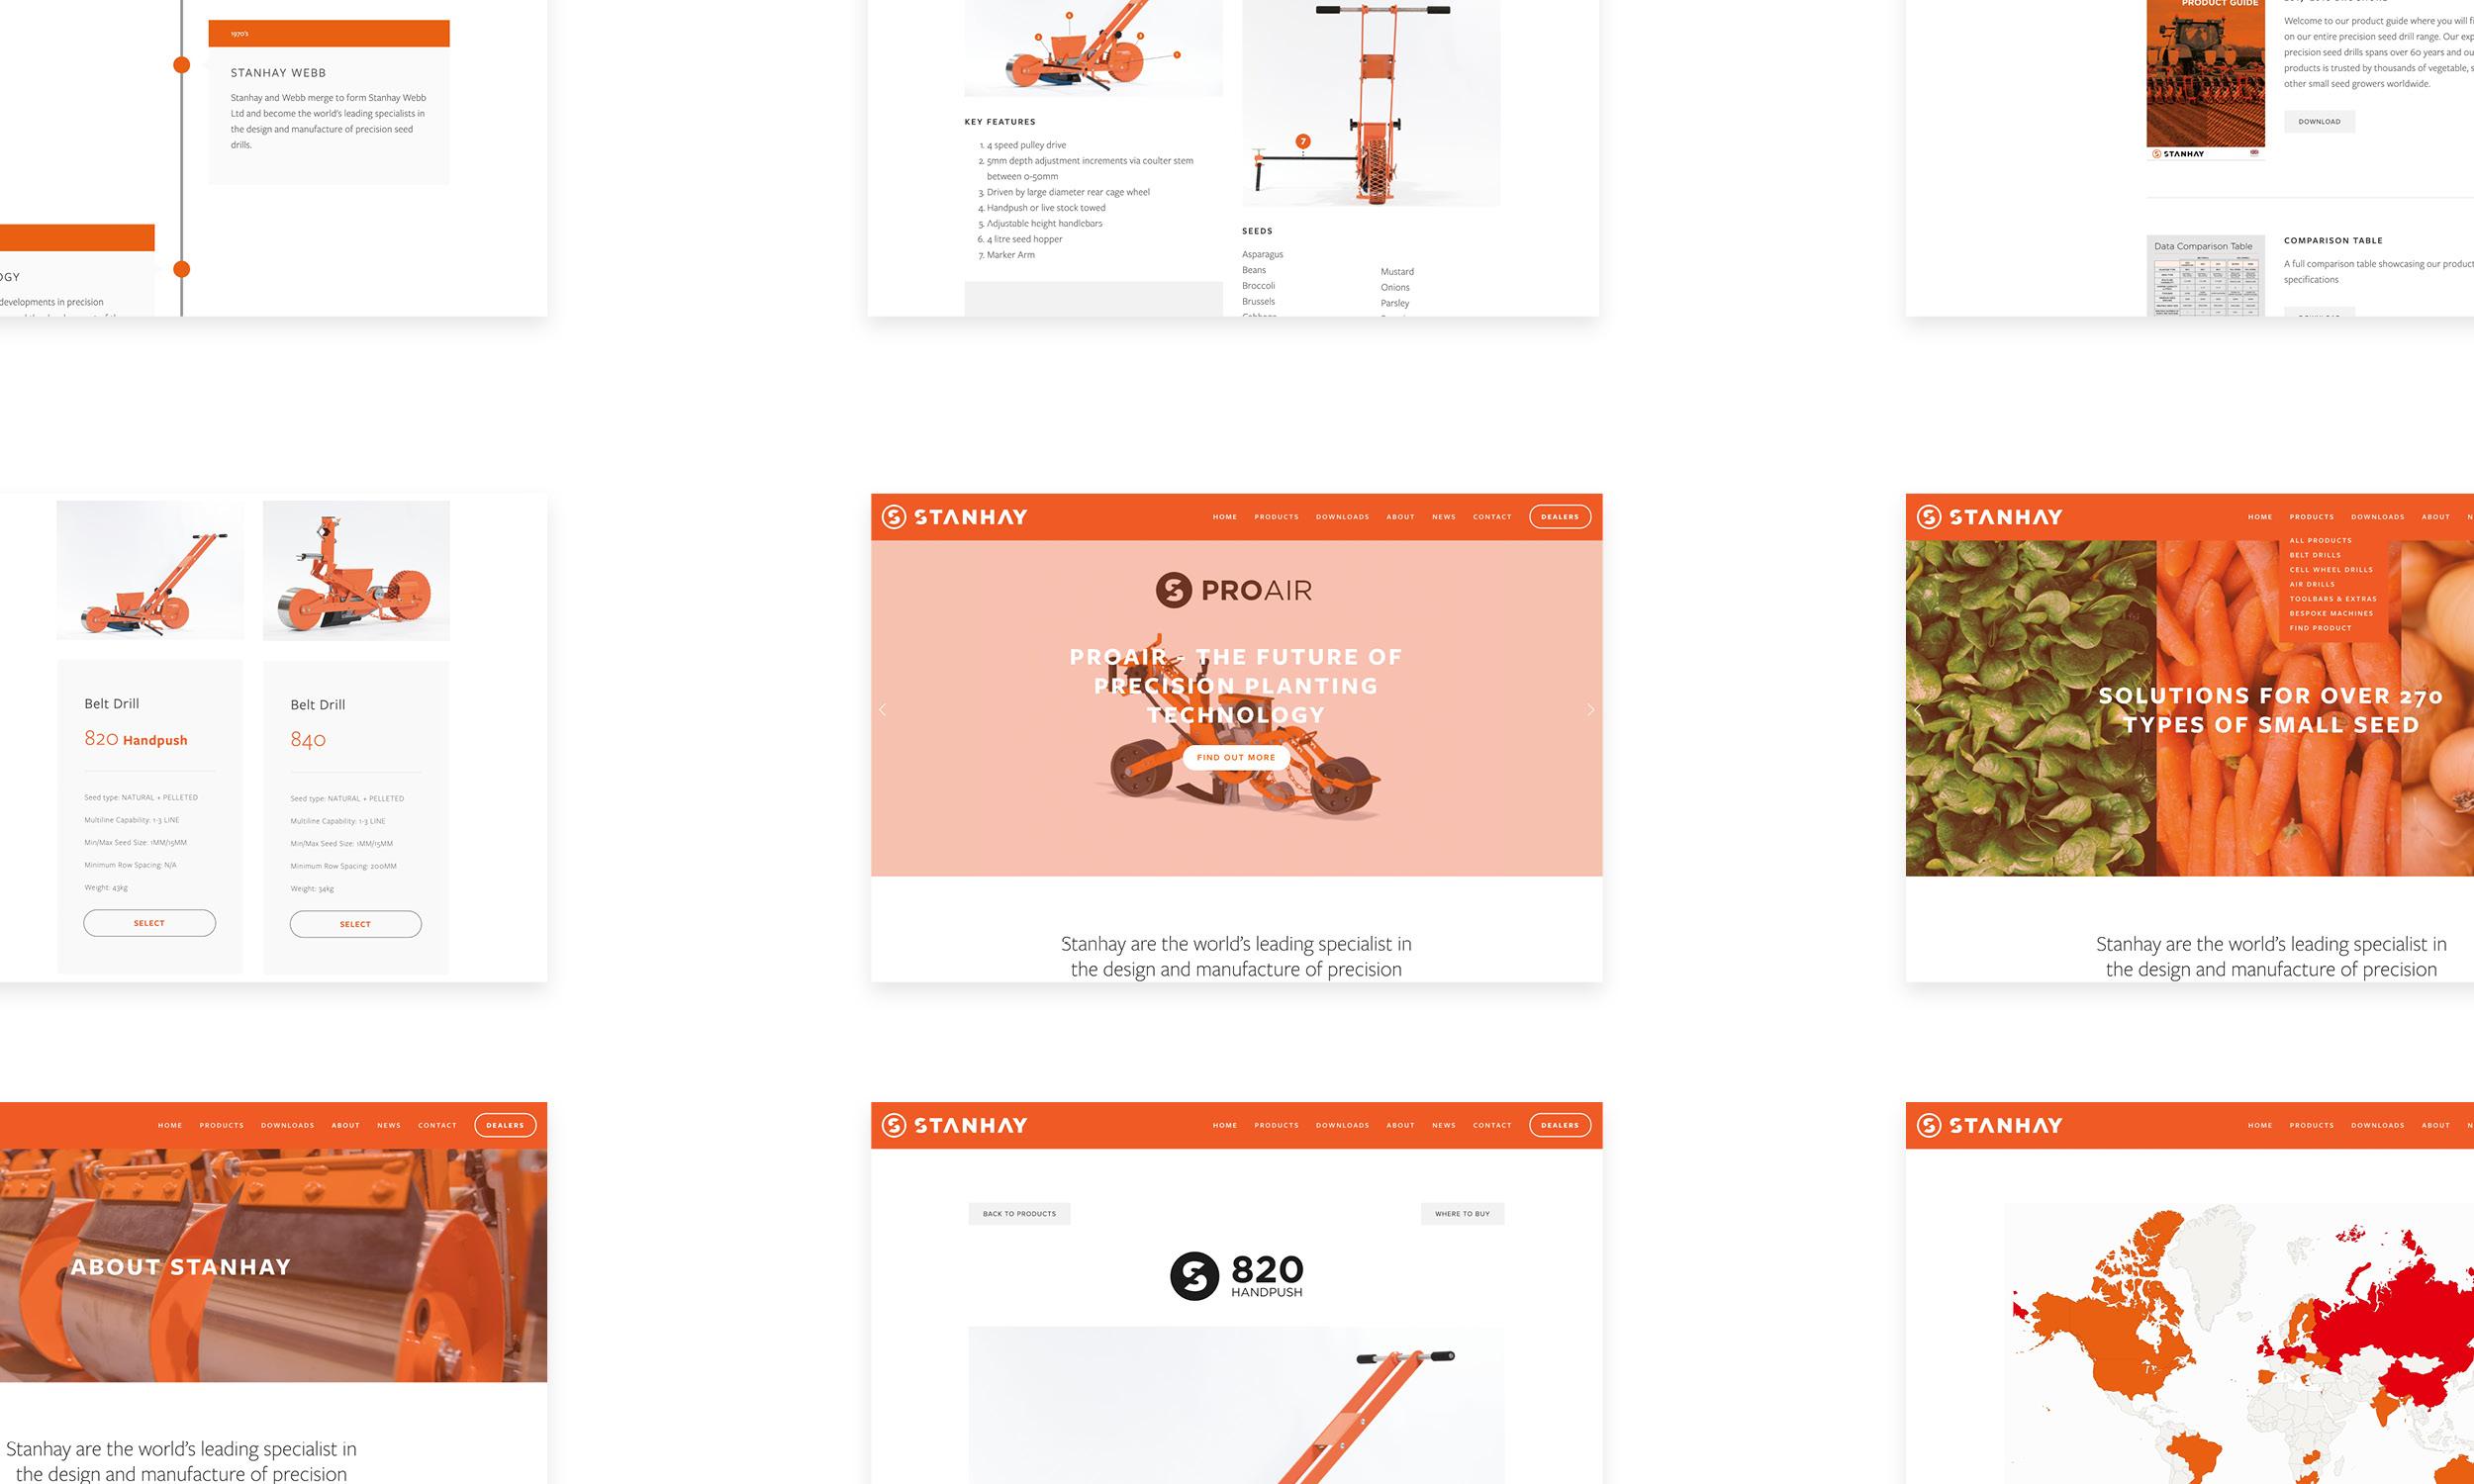 Stanhay-Website-Design-Tile.jpg